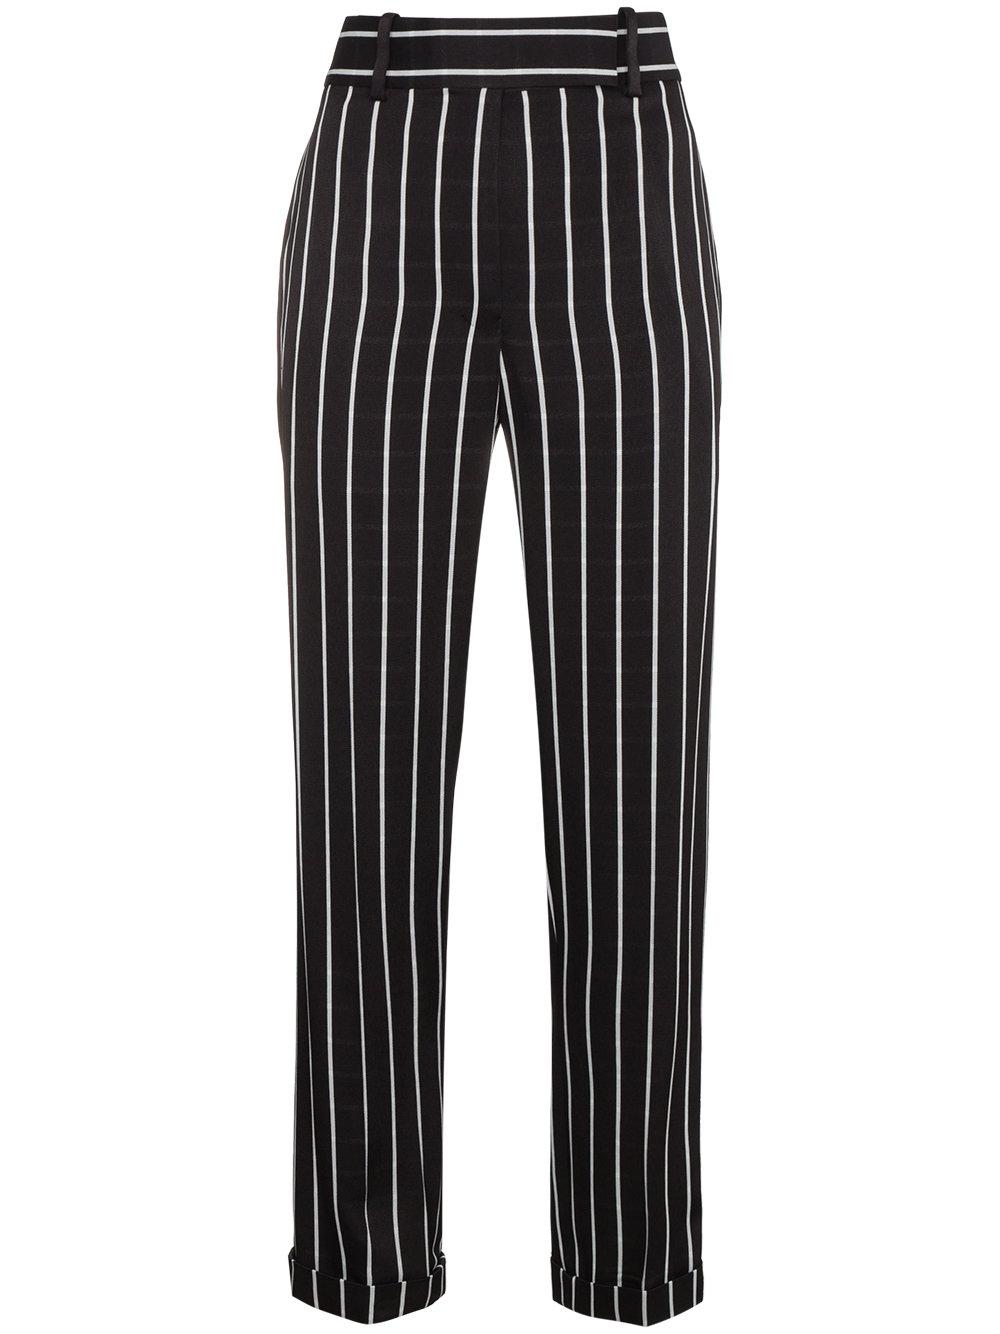 Haider Ackermann   Black and White Striped Trouser